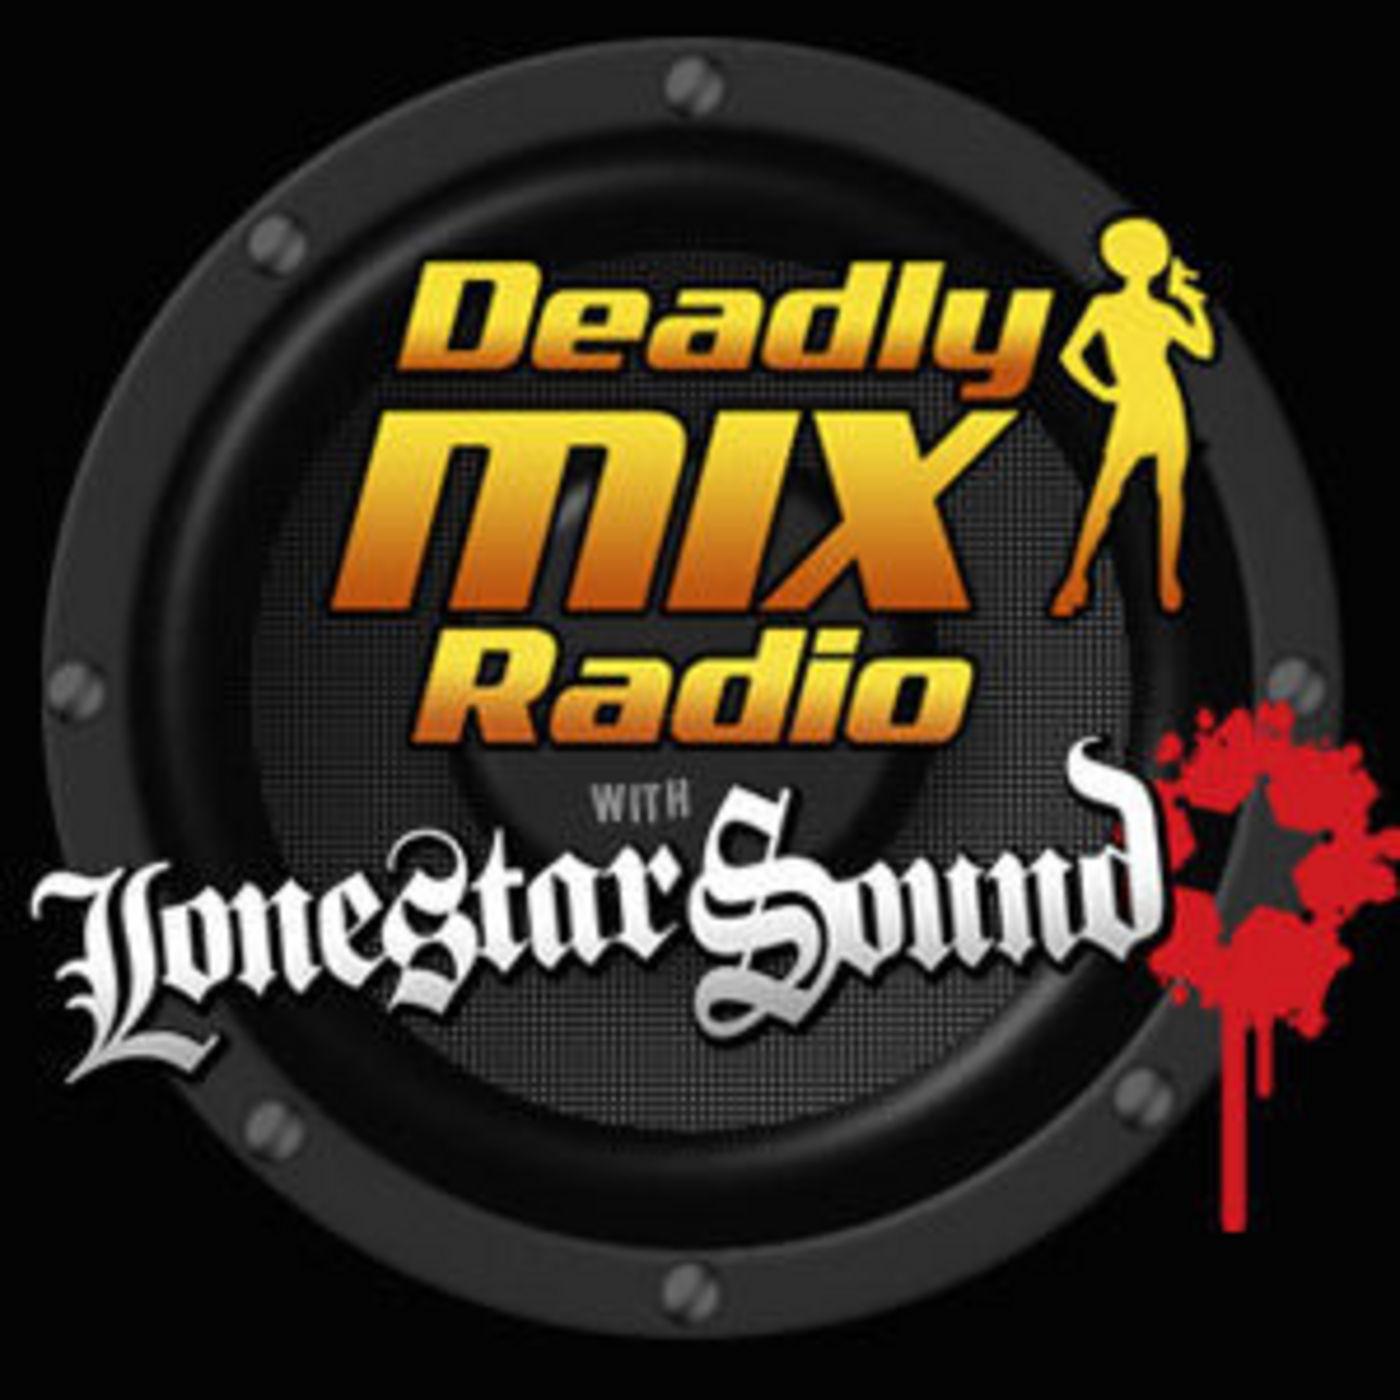 <![CDATA[Bigupradio.com DEADLY MIX RADIO Show]]>